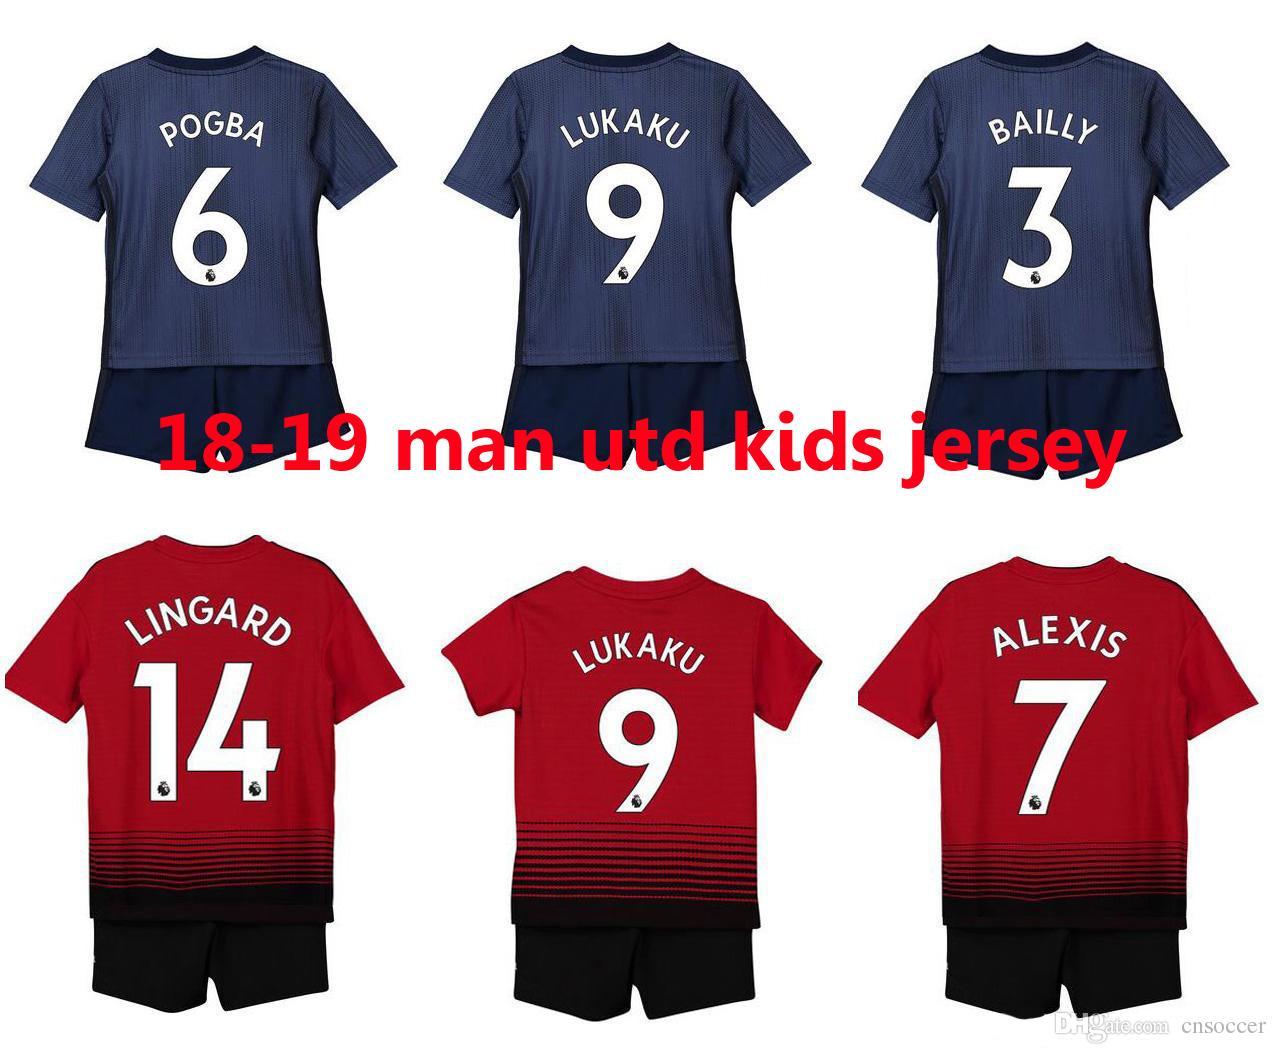 Compre Manchester United Kids Kit Man Utd Kids Soccer Jersey Maillot De  Calidad Superior 2019 Alexis Juventud Mata Kits De Fútbol Infantil Maillot  De Pie ... d693ce7d9b497